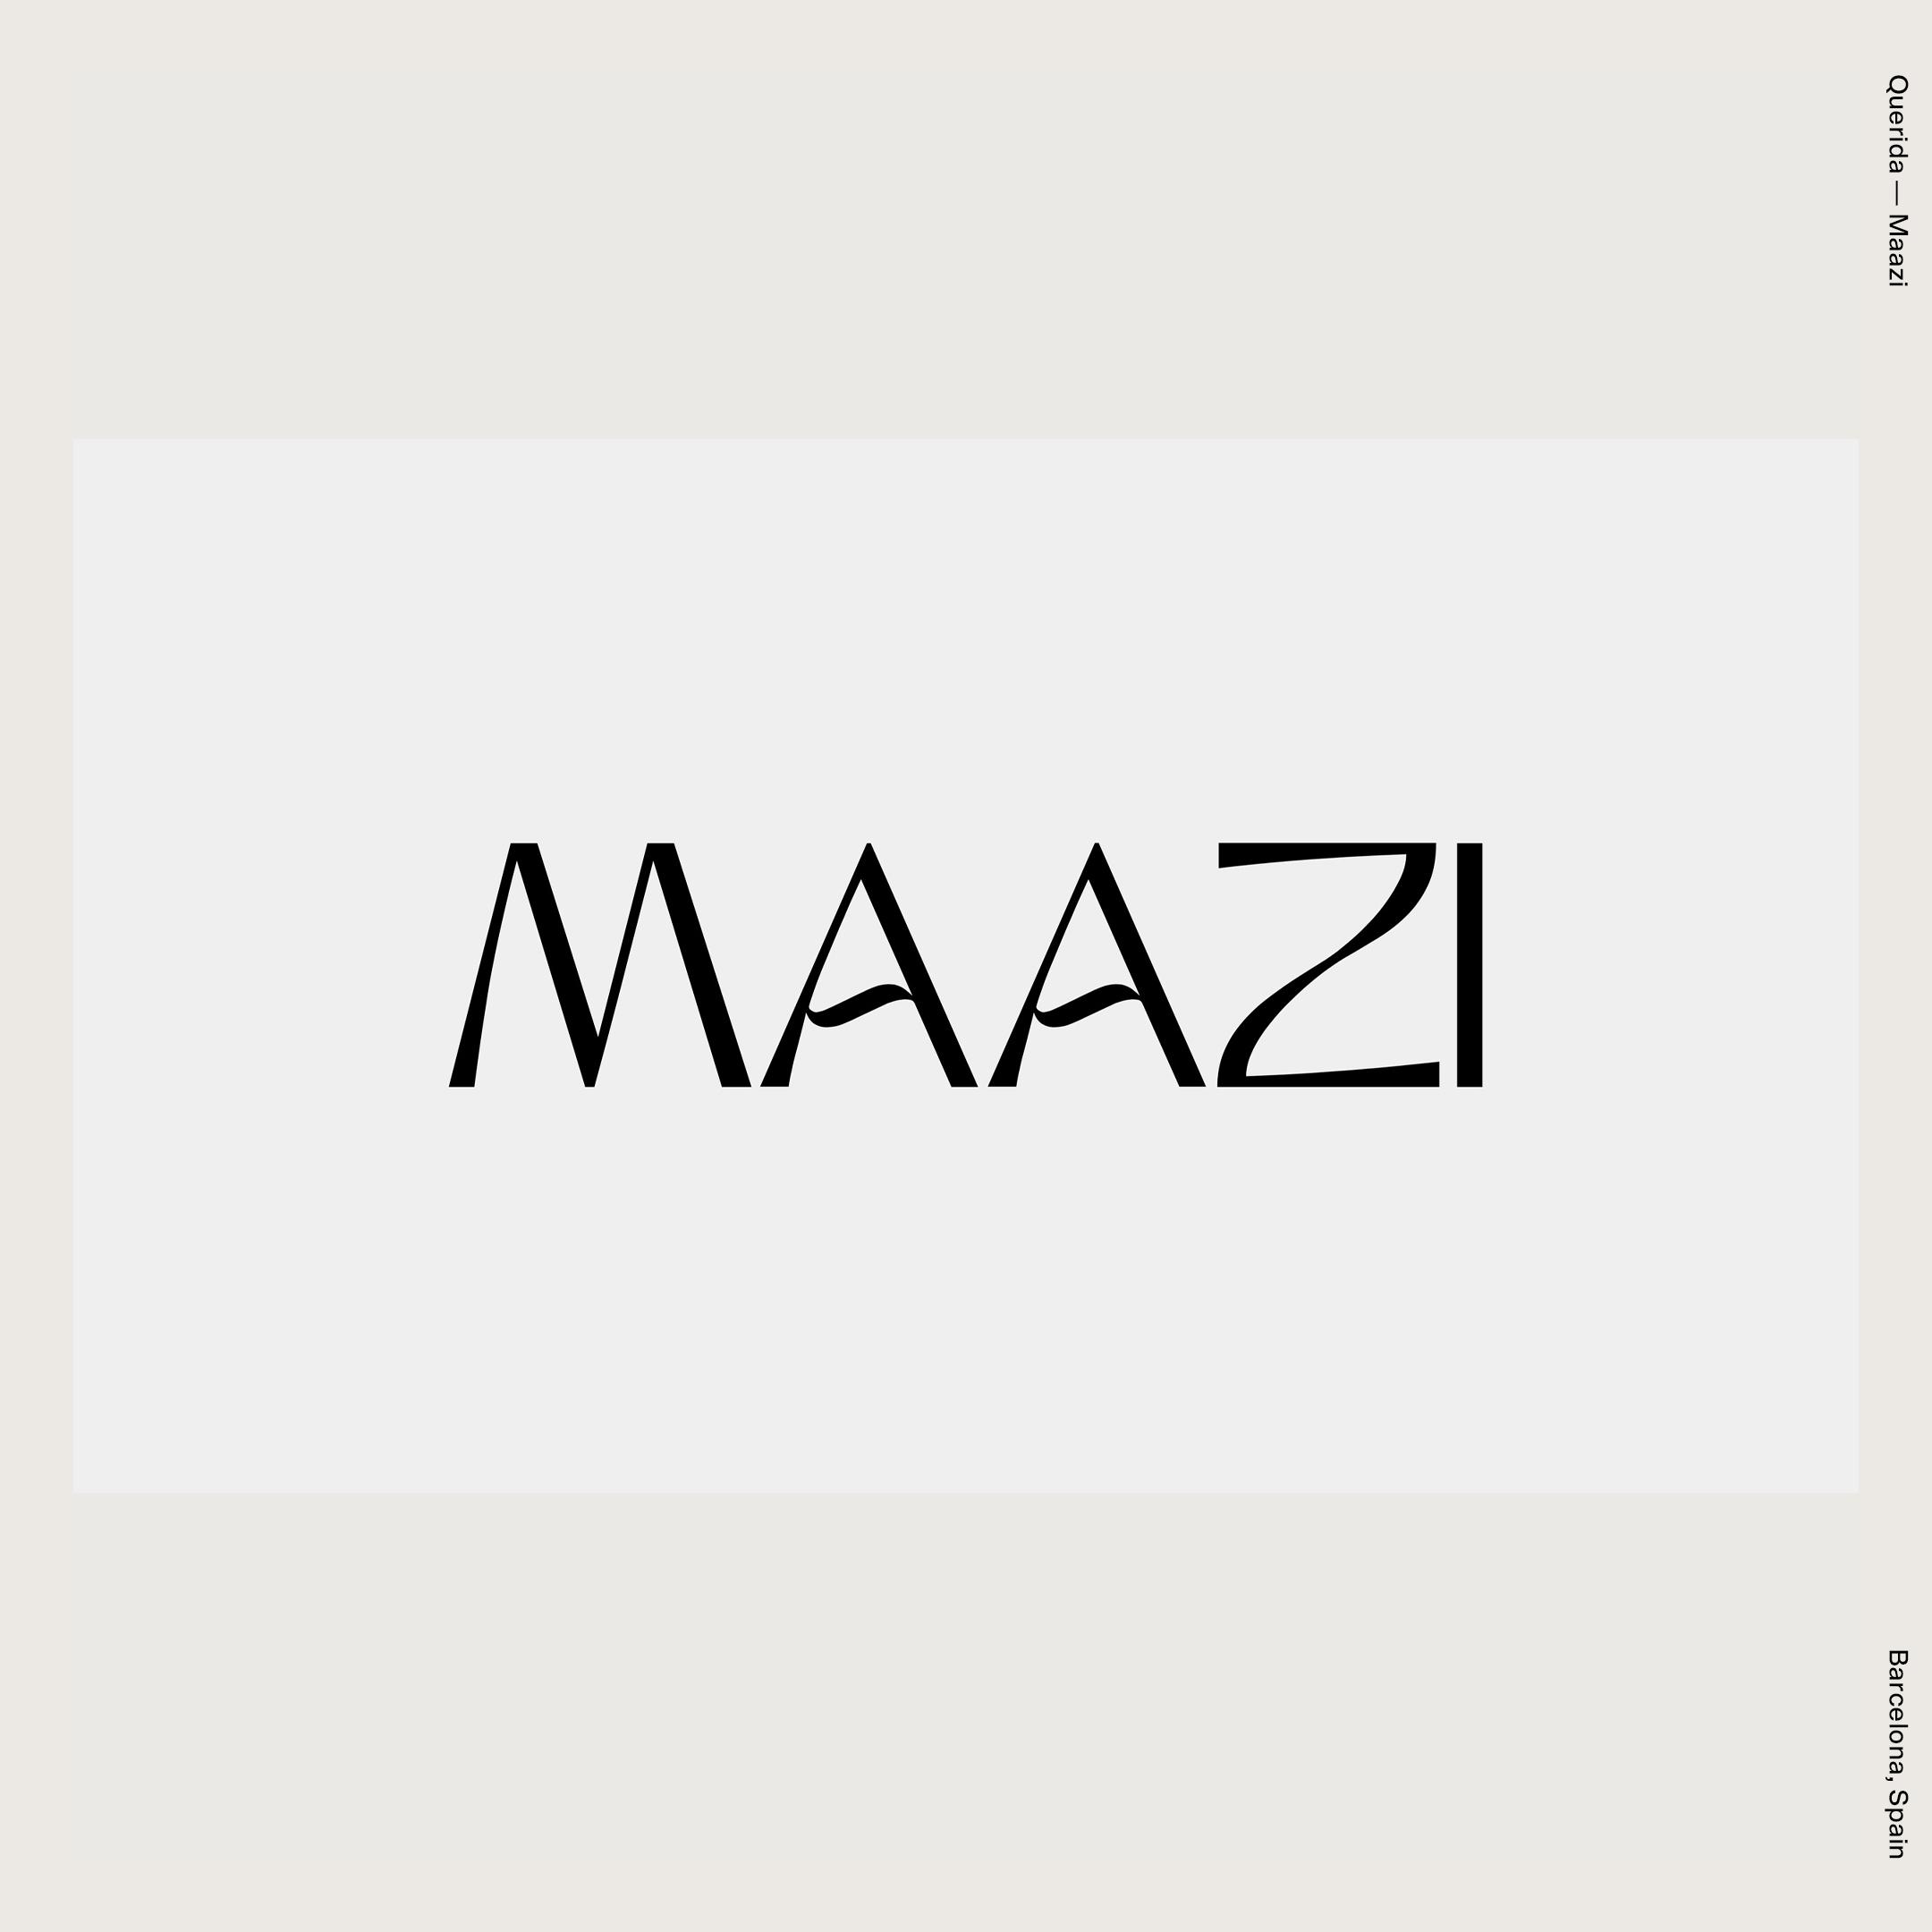 Querida —Maazi